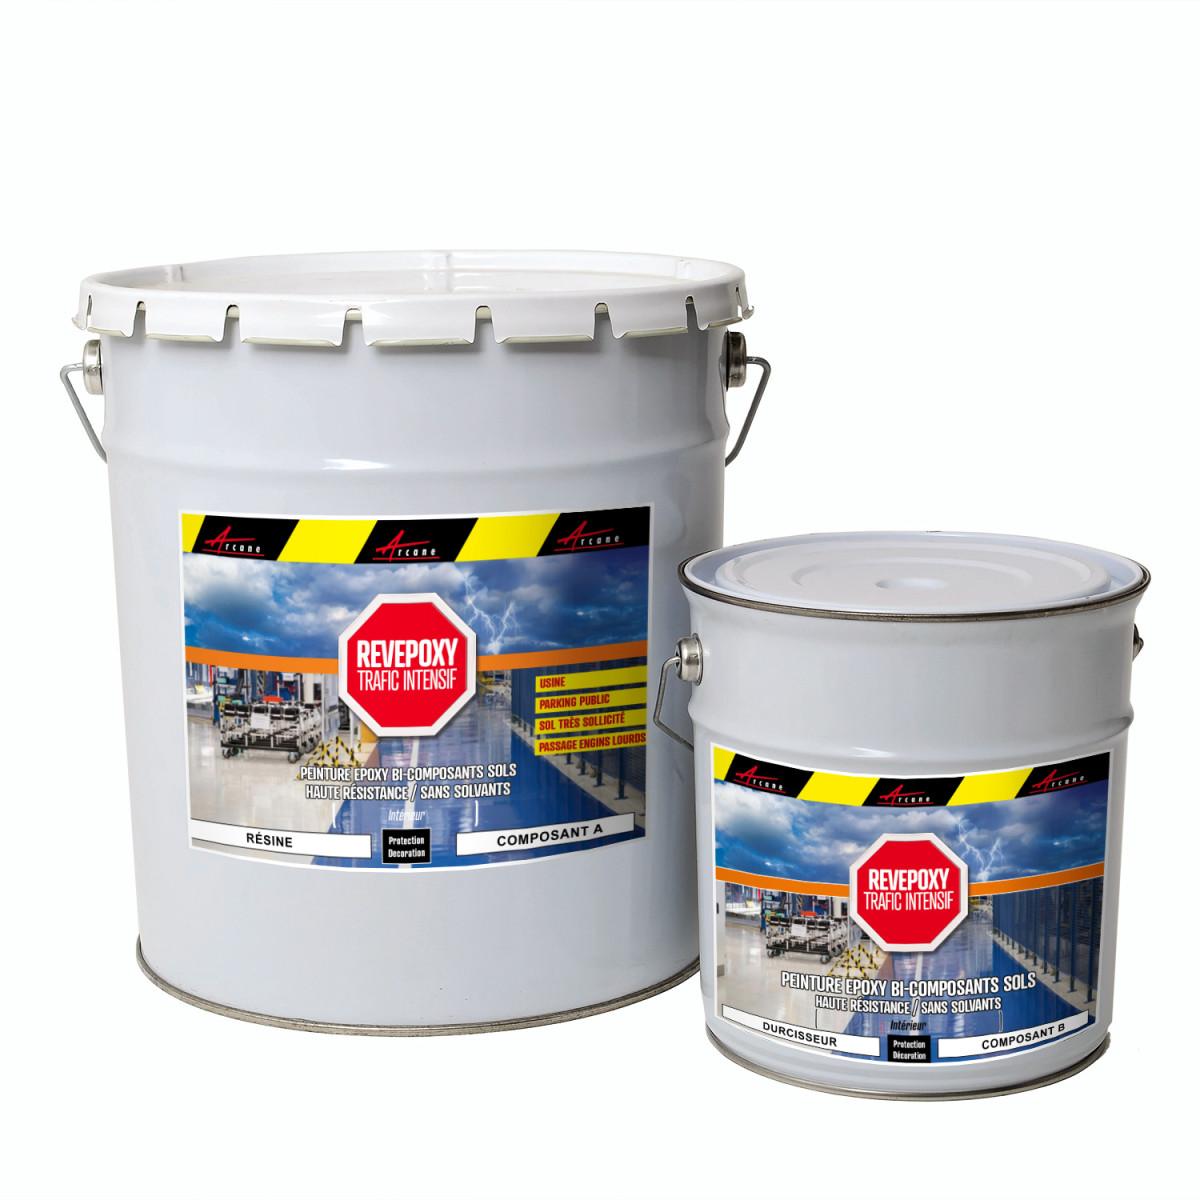 Peinture bi composant revêtement epoxy industriel - REVEPOXY TRAFIC INTENSIF